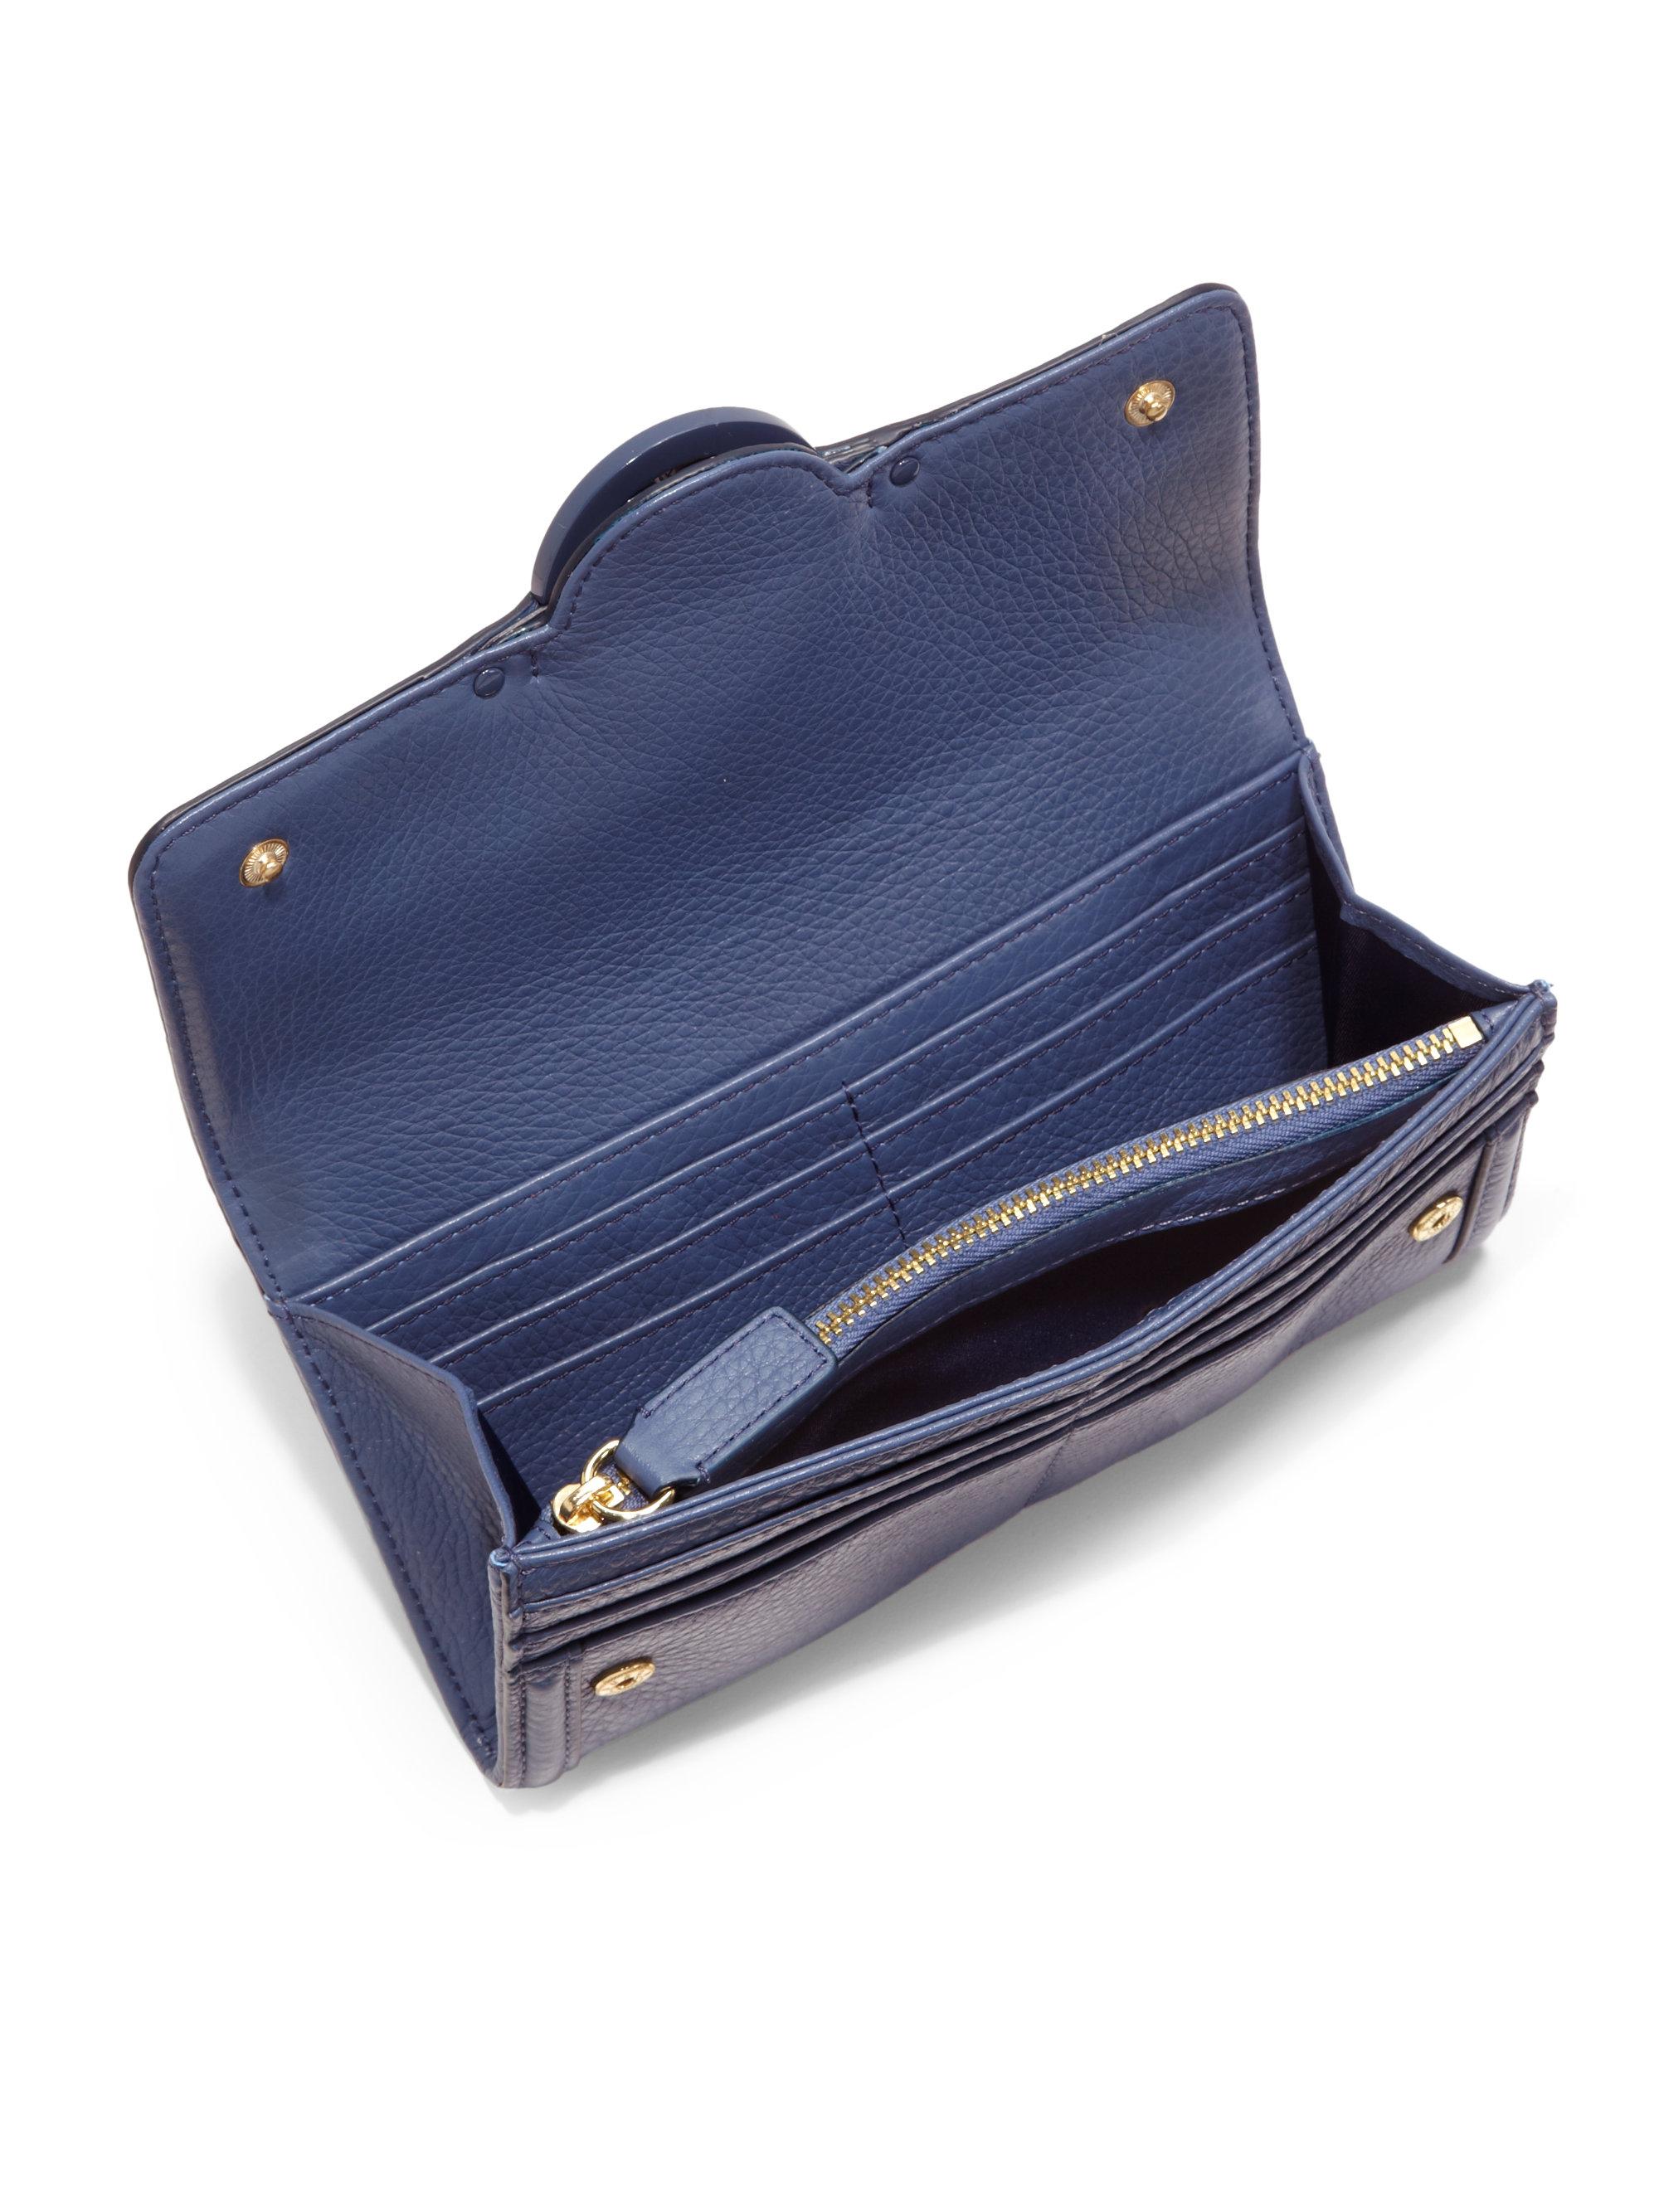 Tory burch Amanda Envelope Continental Wallet in Blue | Lyst